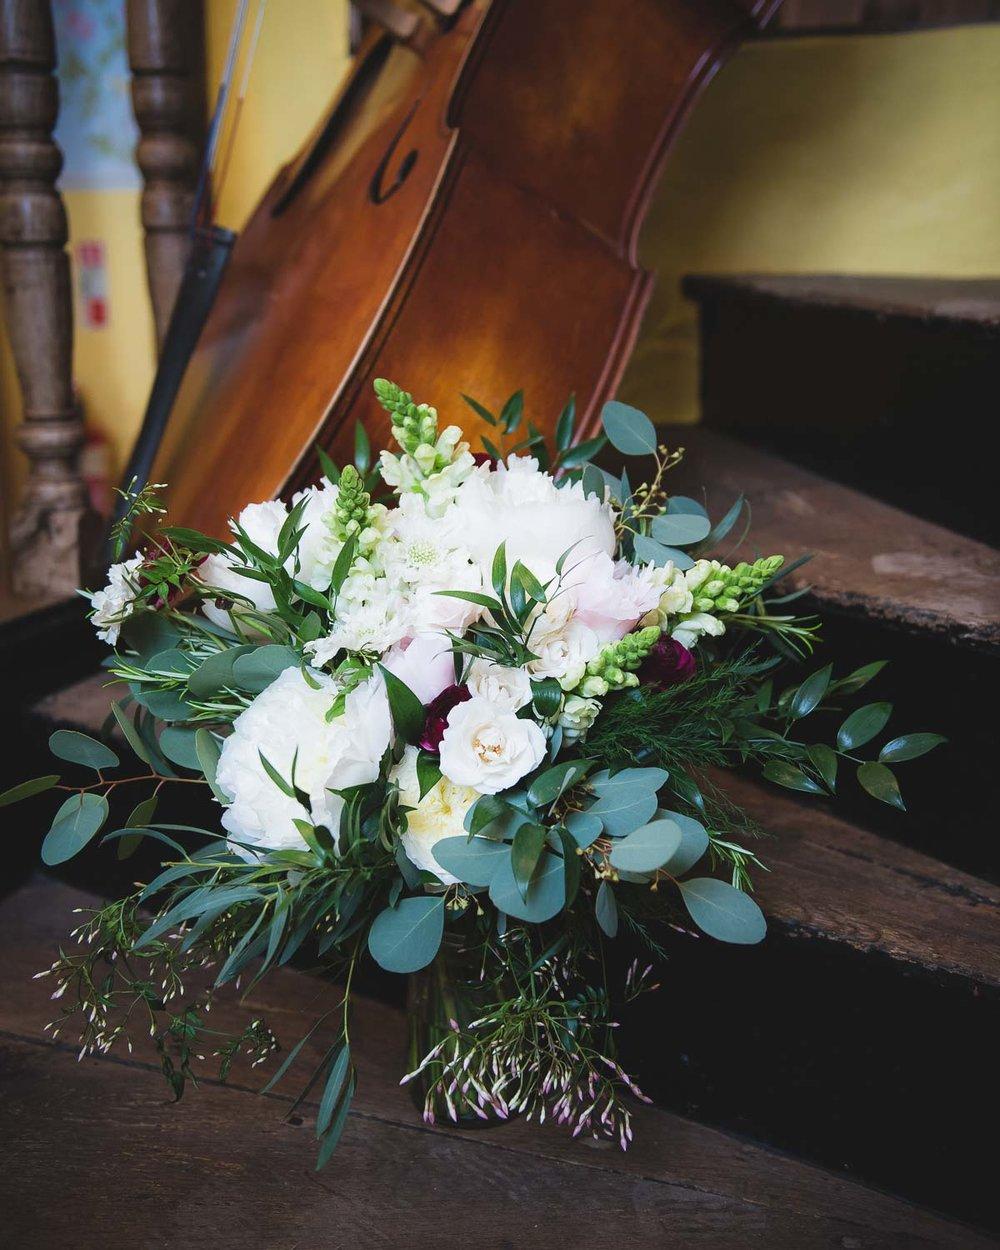 reportage-wedding-photographer-bristol-12.jpg